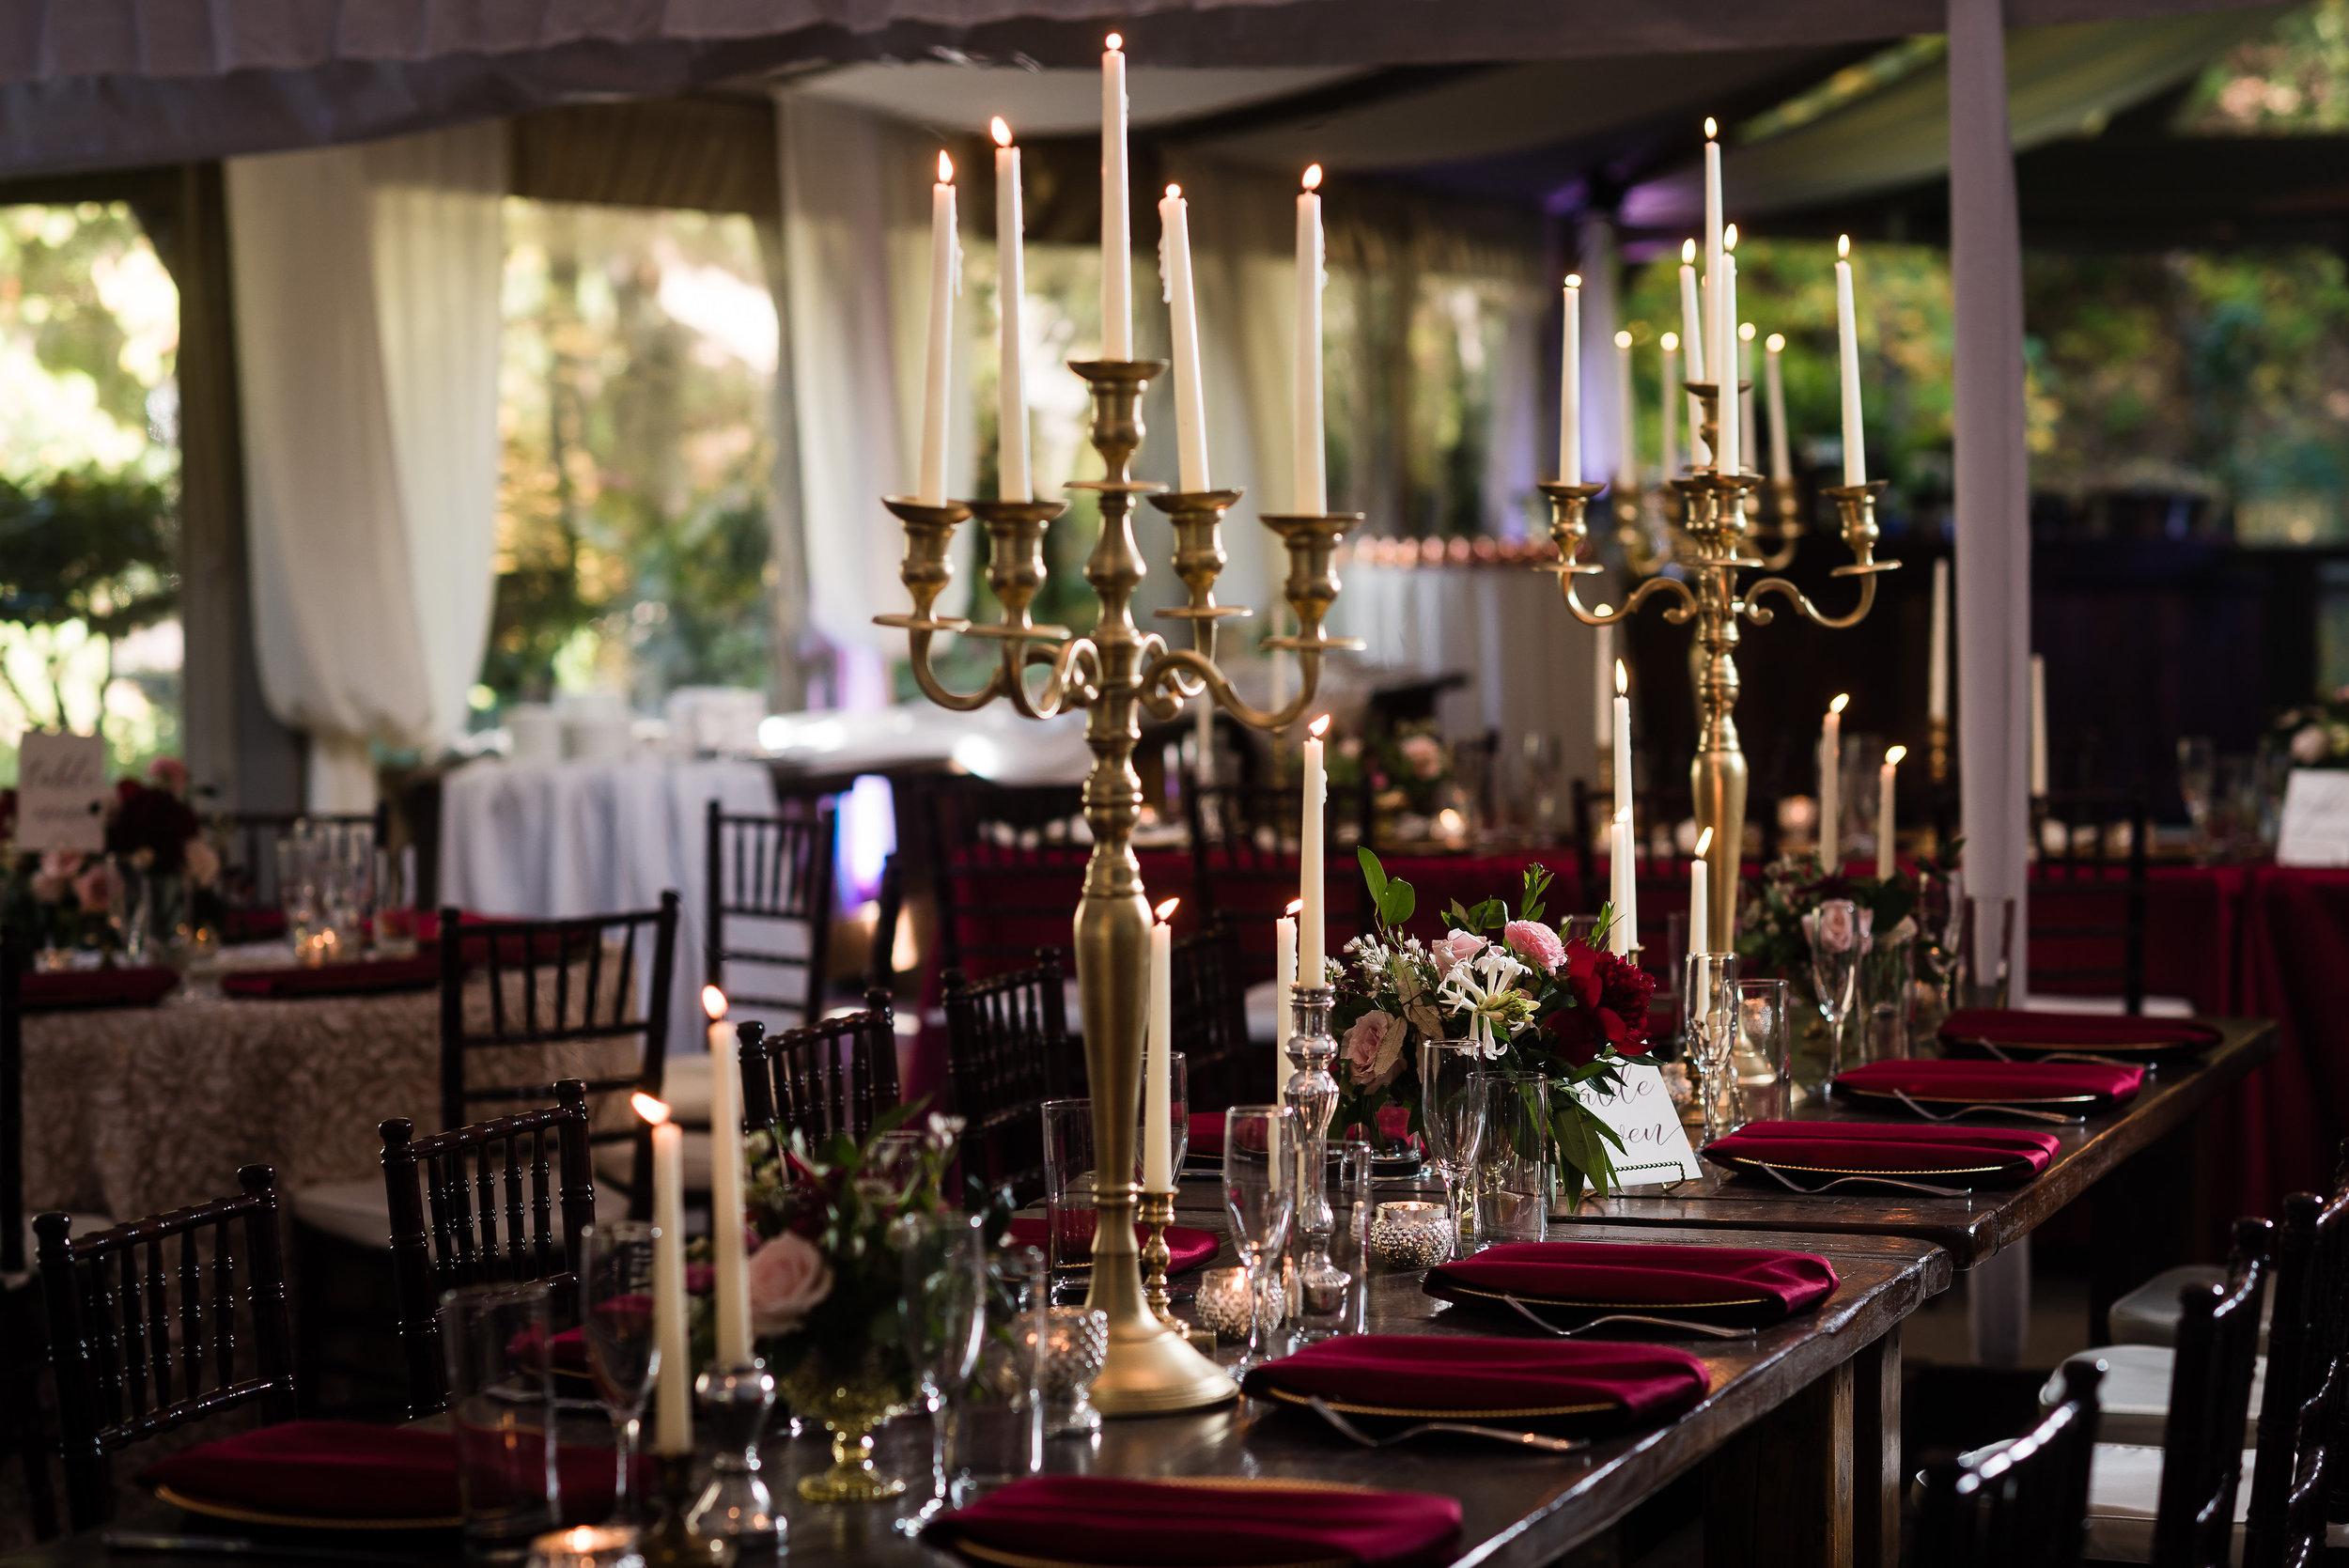 20161022_hawkesdene_fall_wedding_photos_0755.jpg